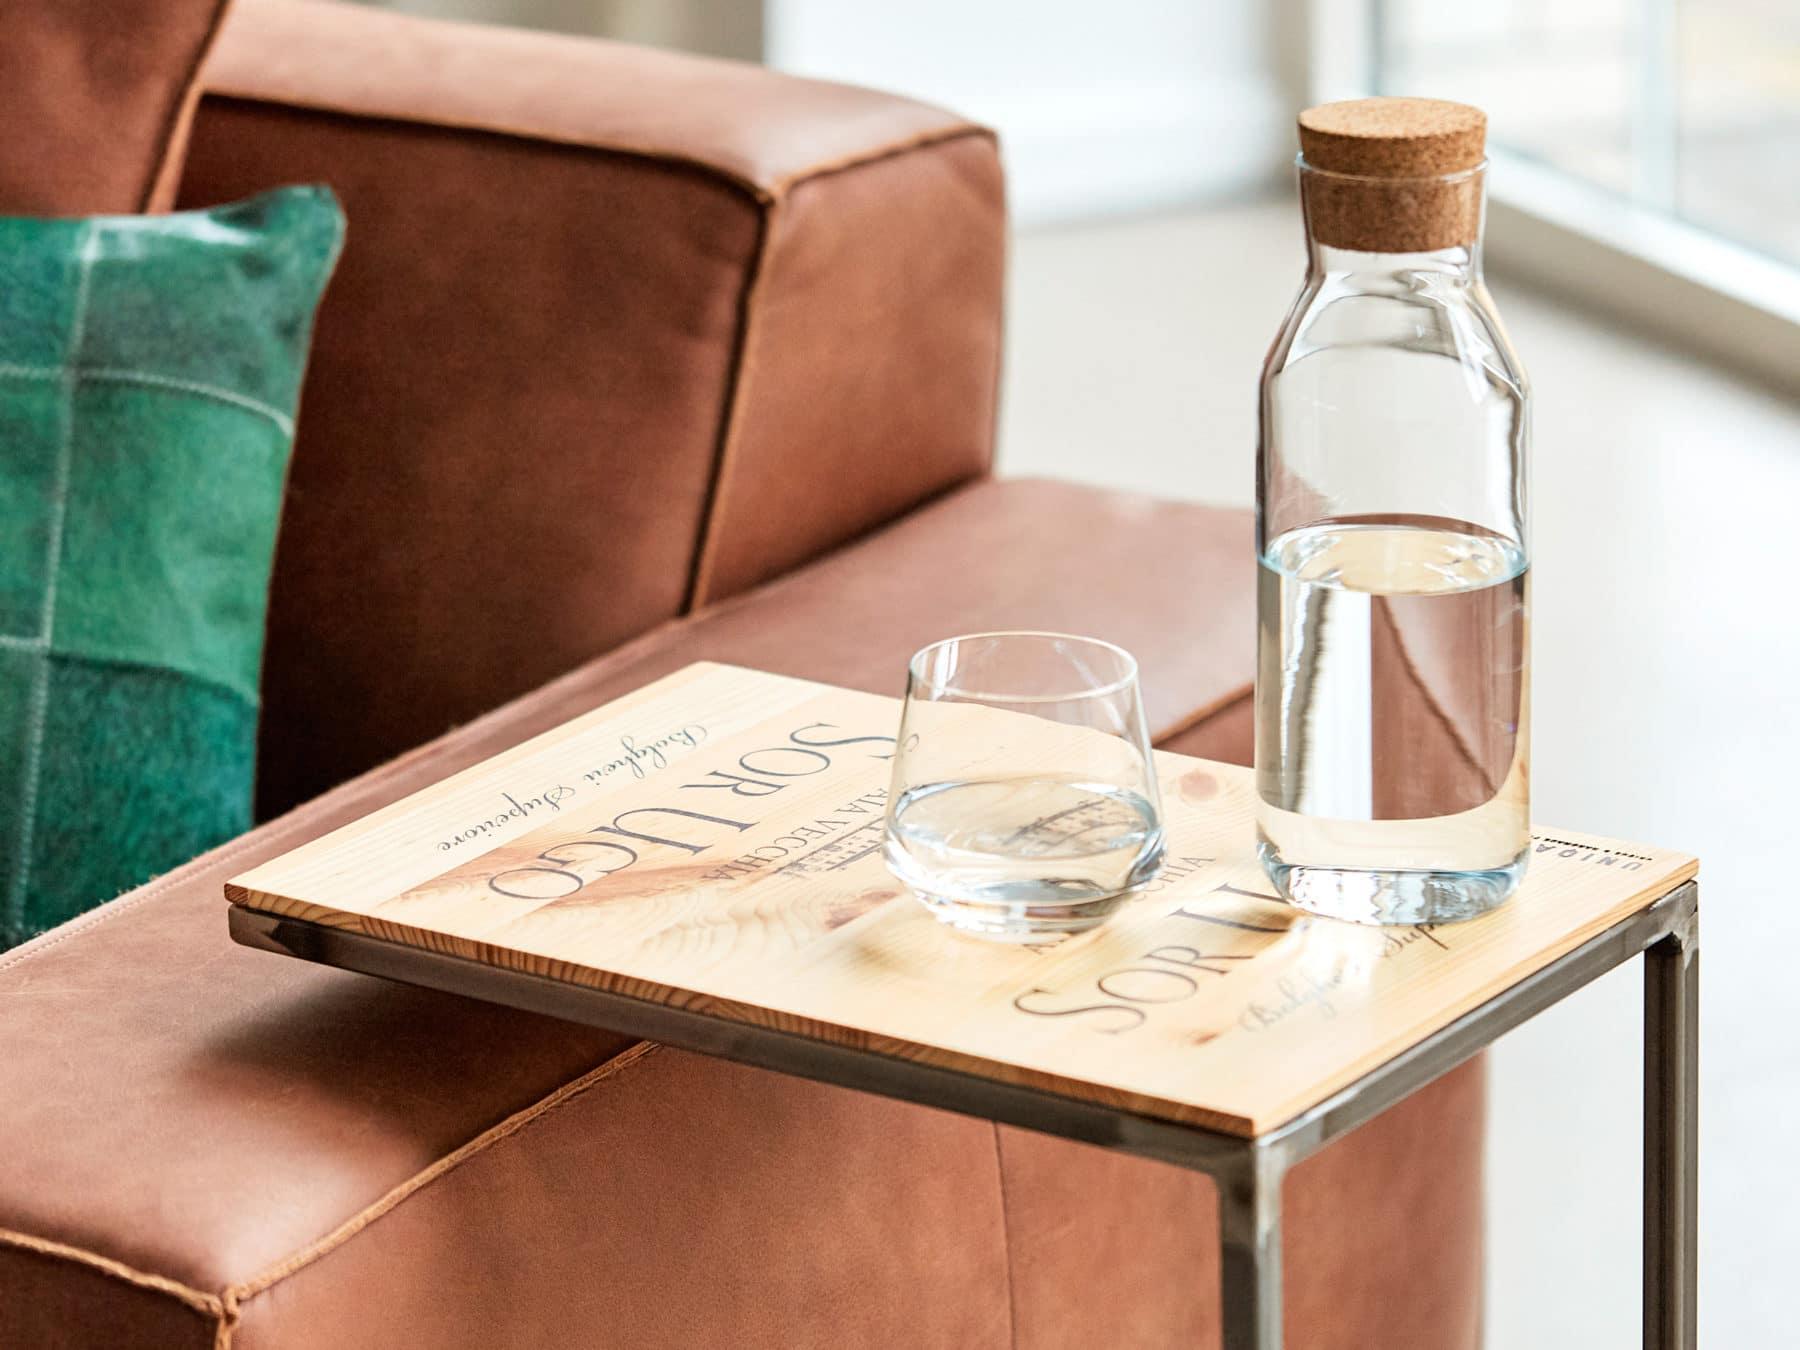 Beistelltisch emillion weinkiste uniqamo KURTS handmade swissmade sofa wasserkaraffe